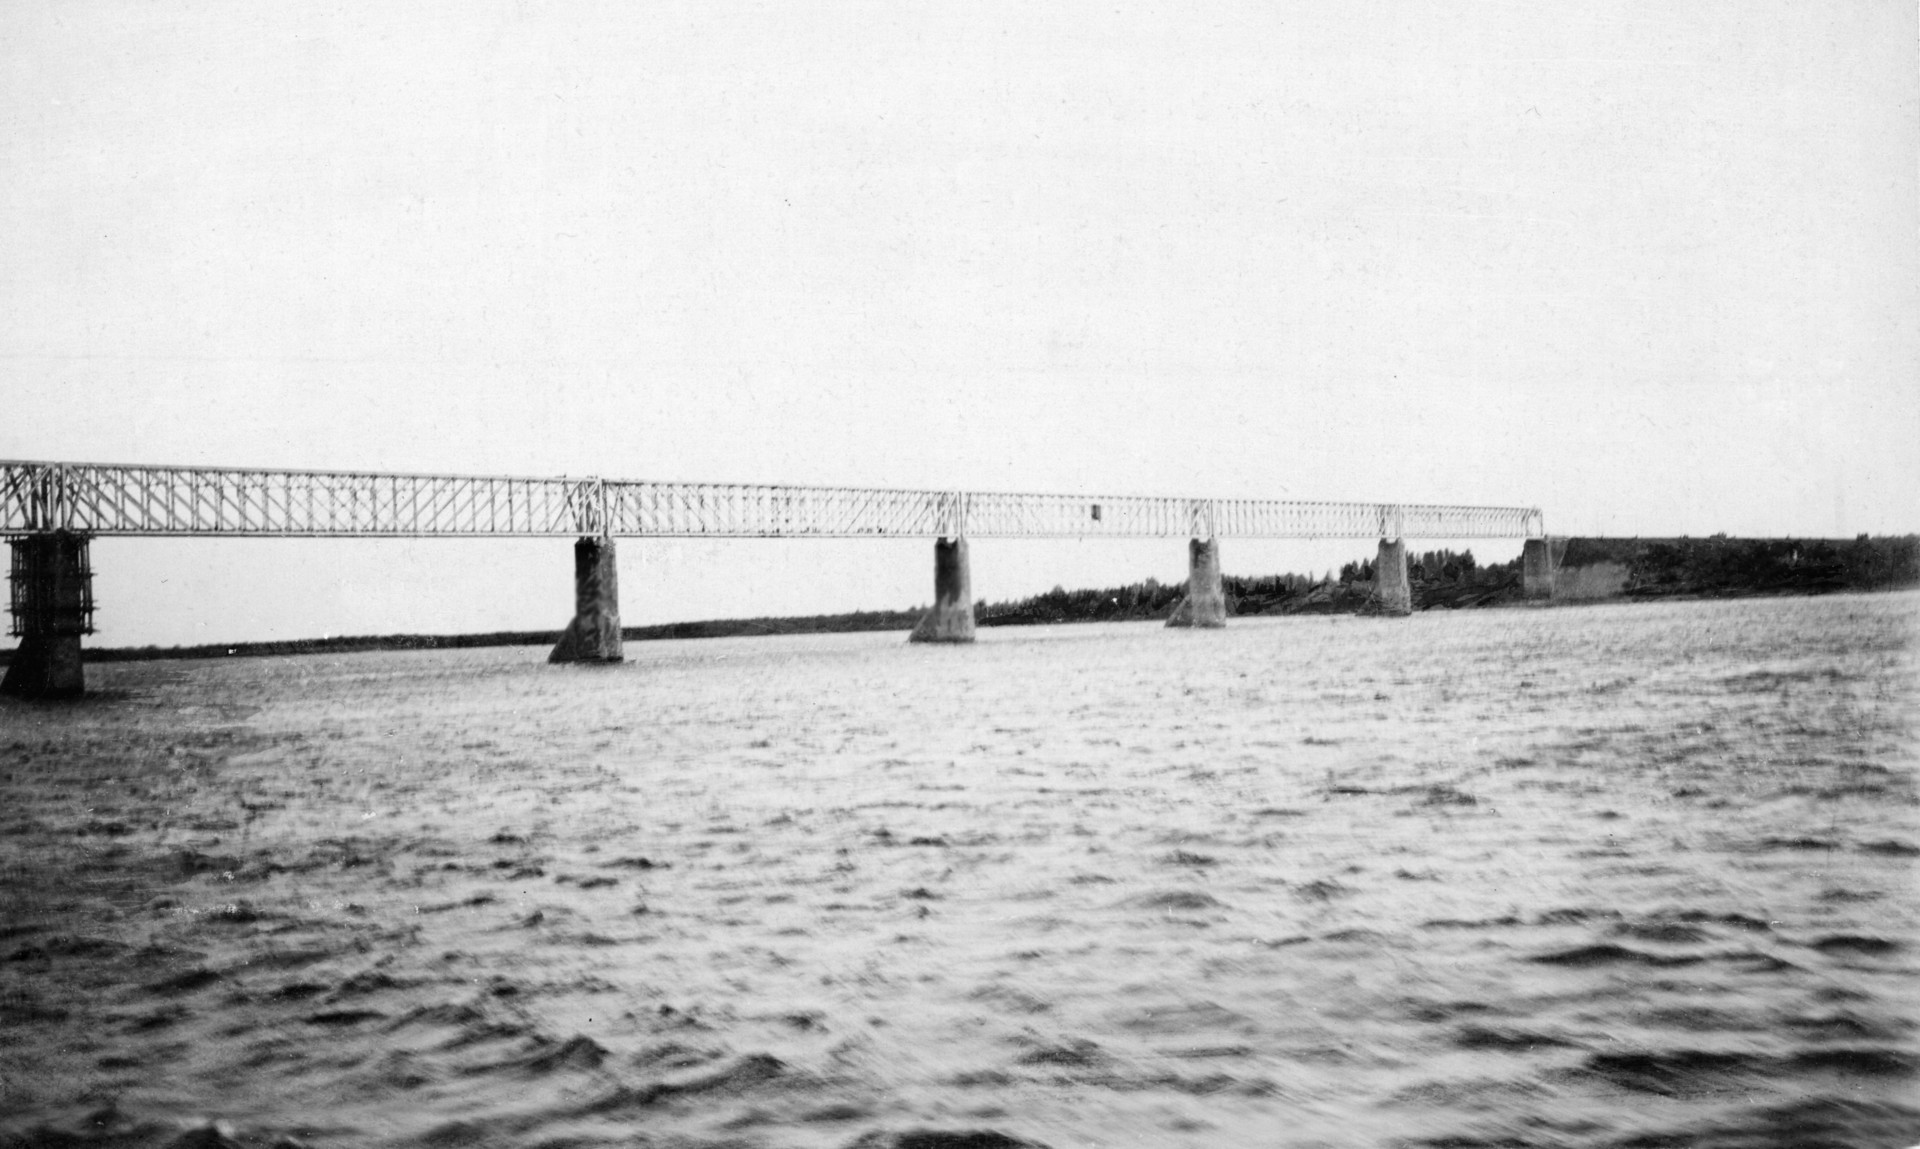 Most nad Volgo okoli leta 1900